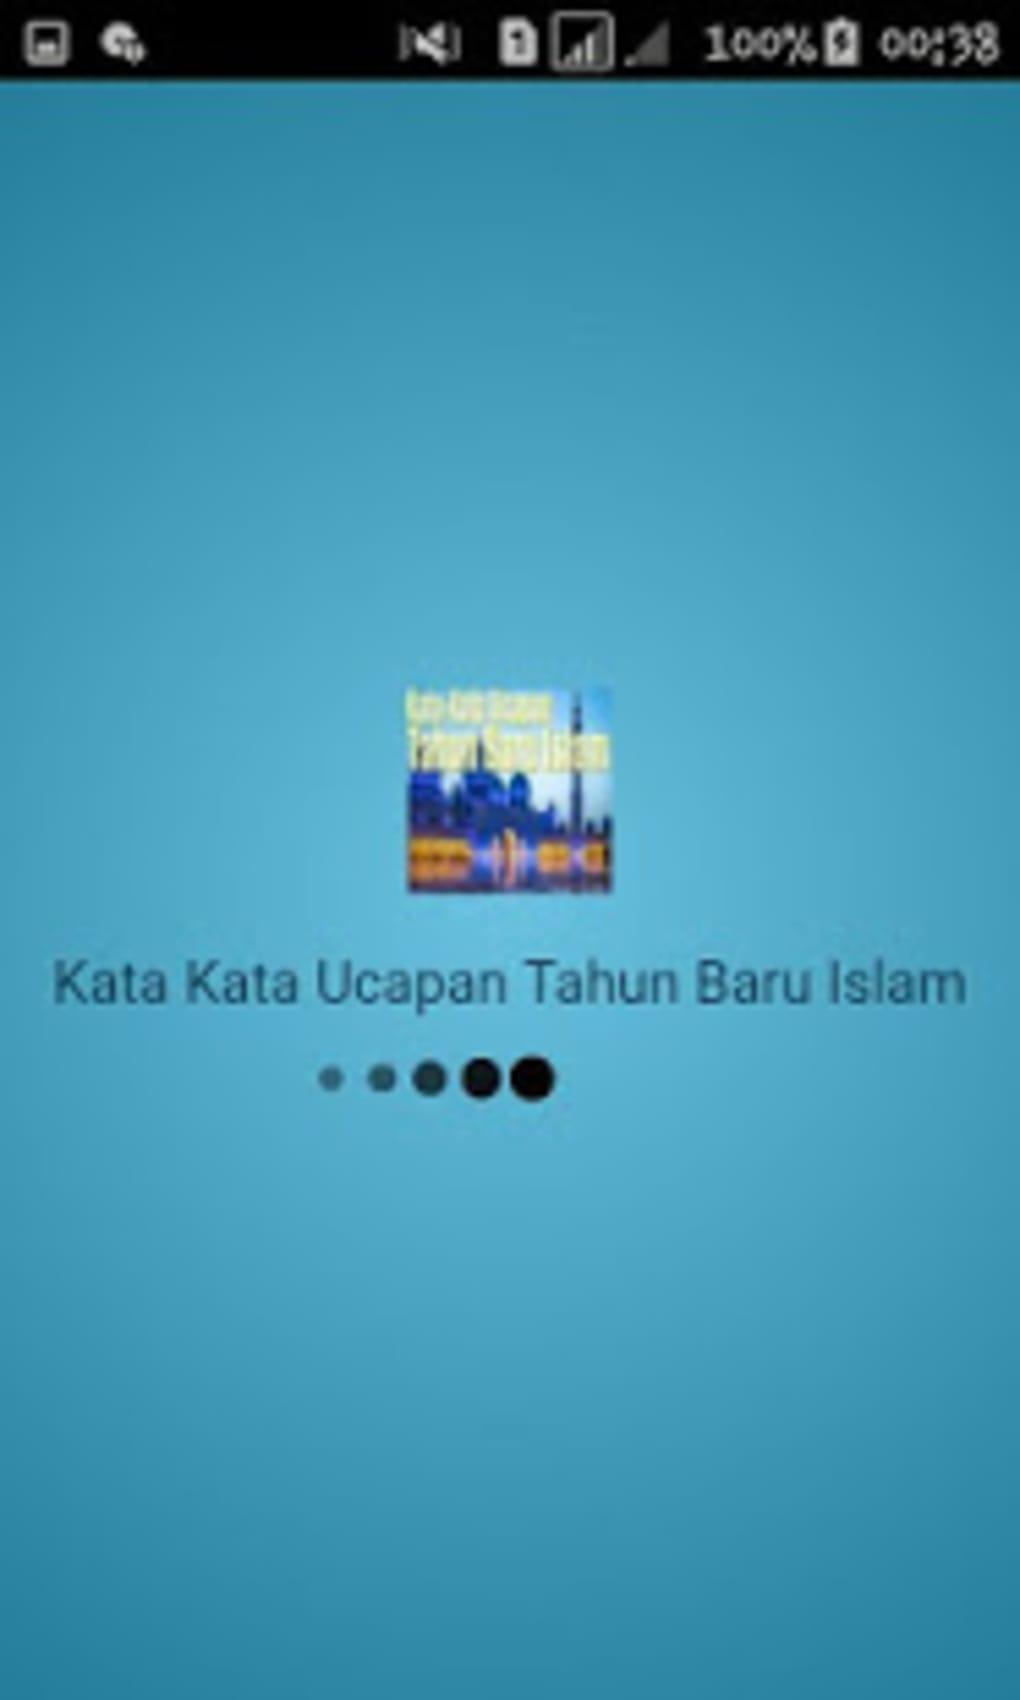 Kata Kata Ucapan Tahun Baru Islam Untuk Android Unduh